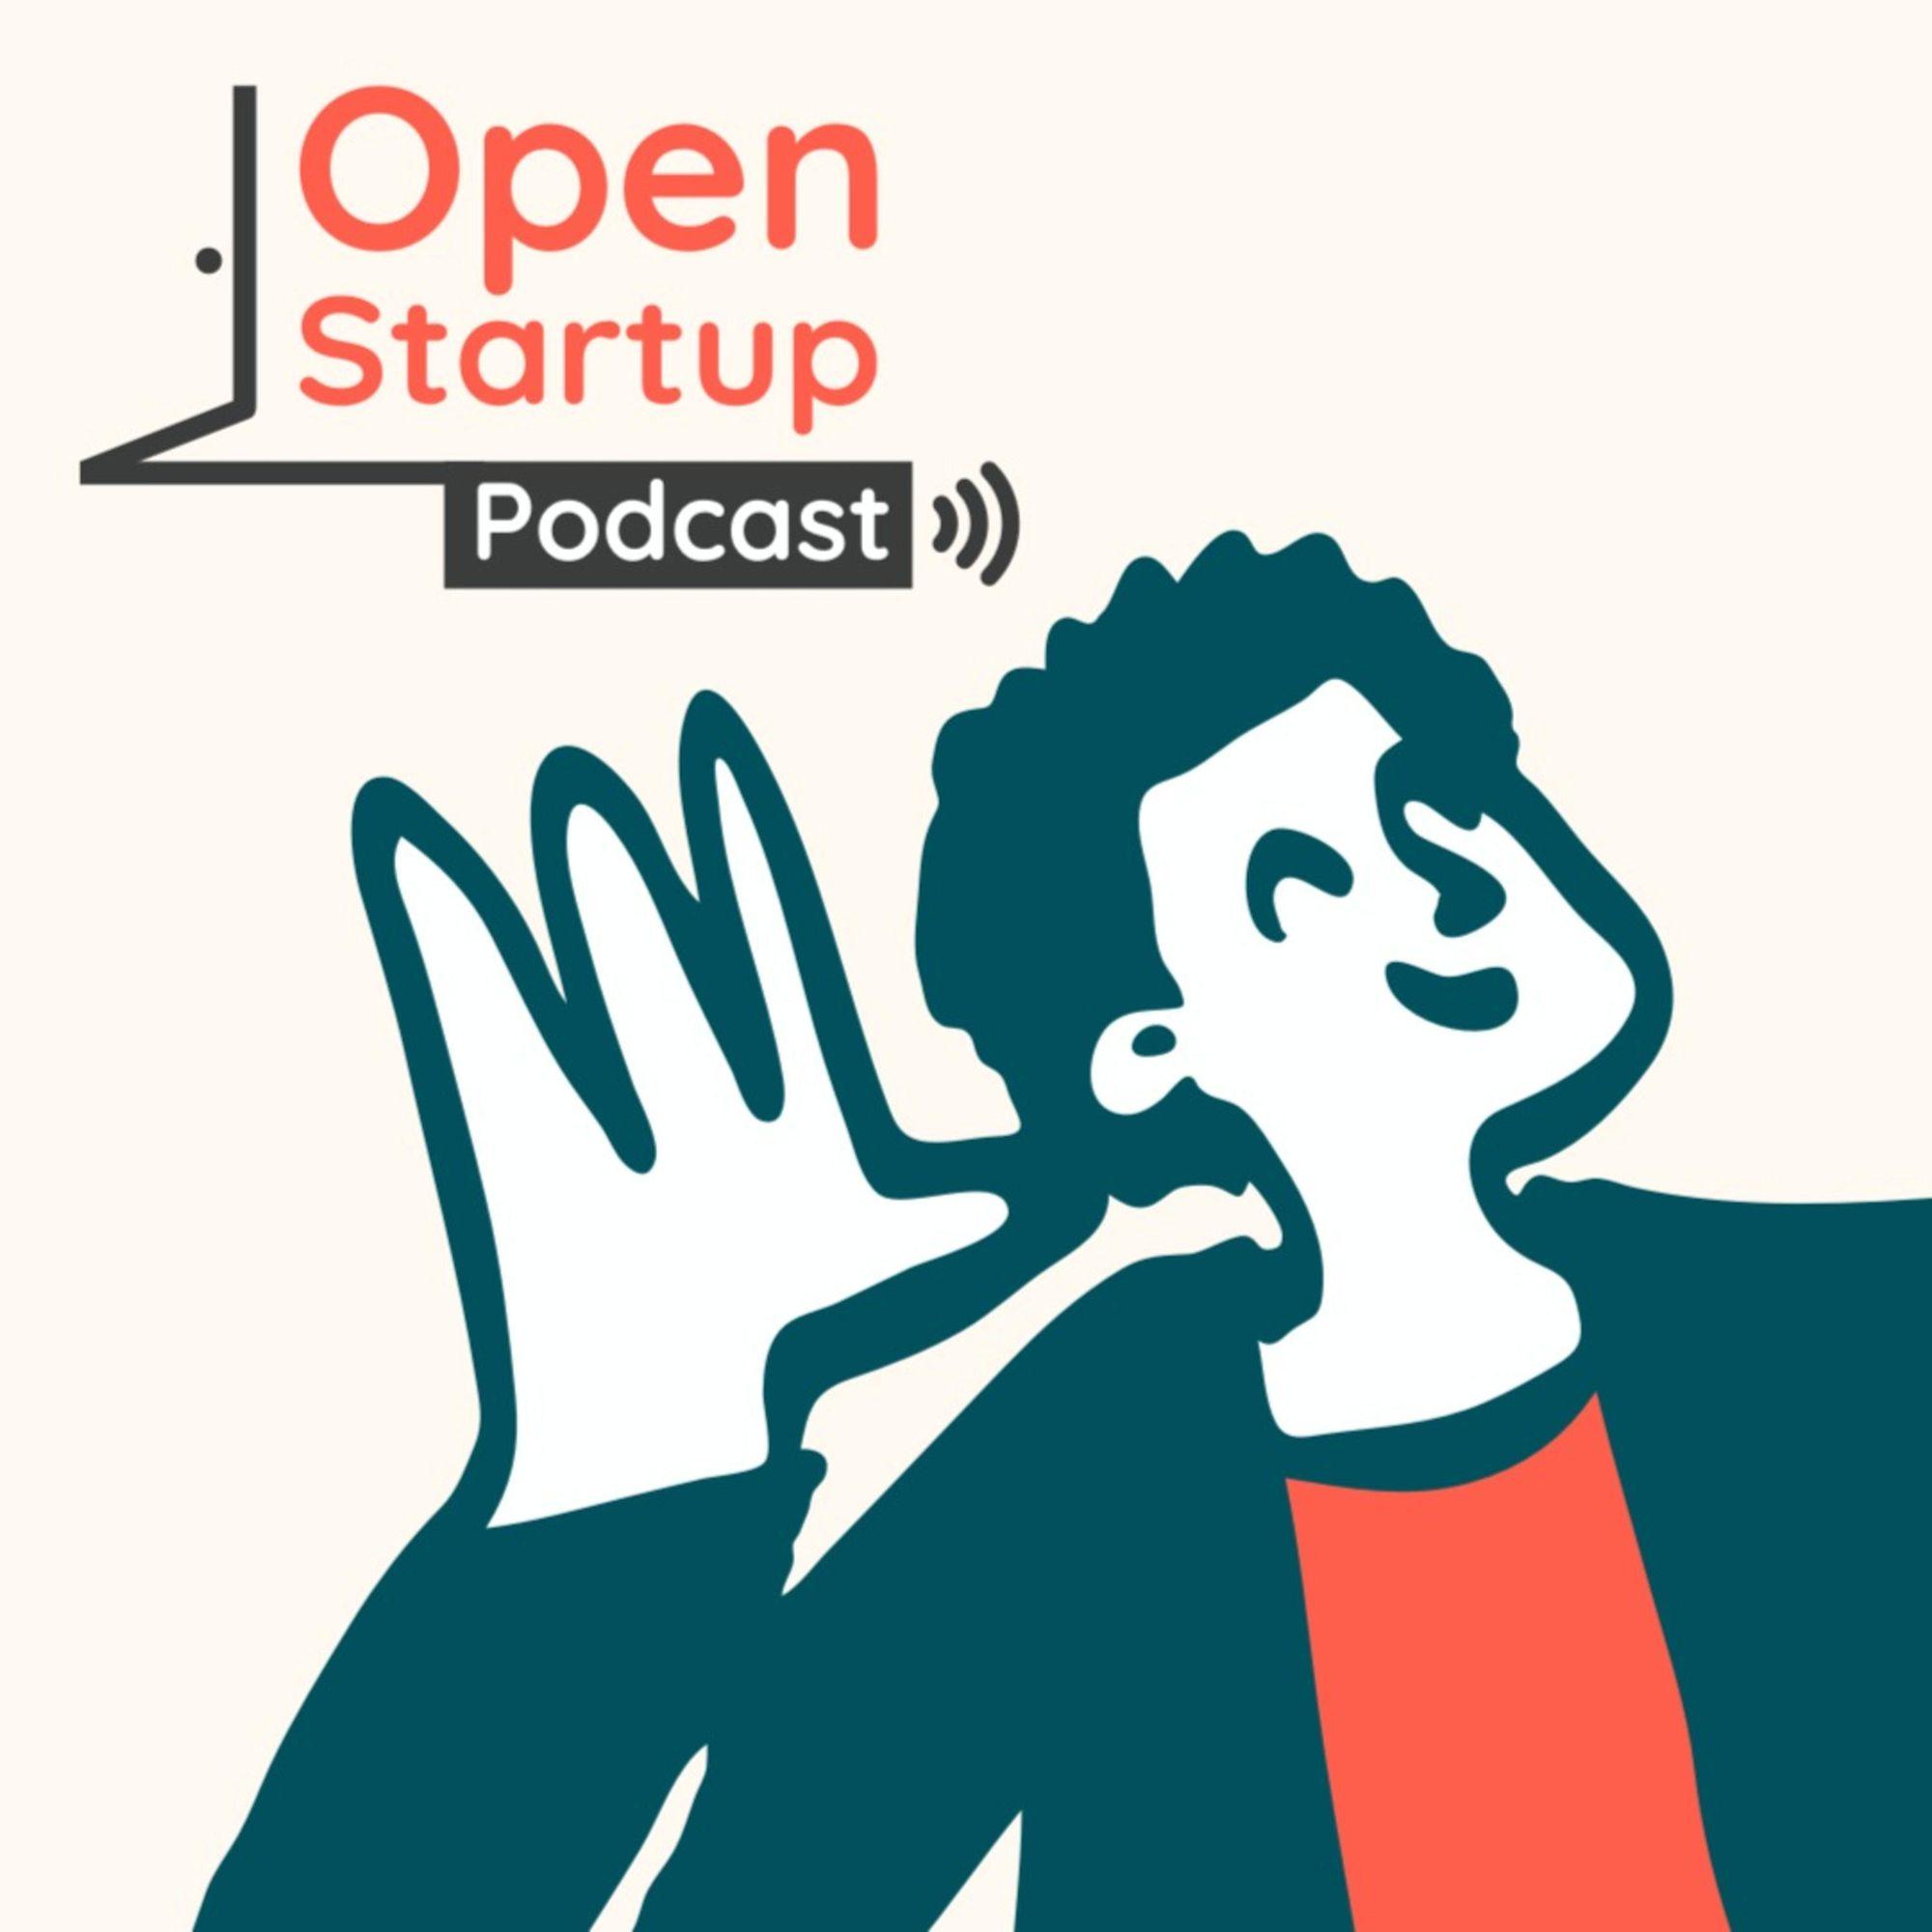 Open Startup